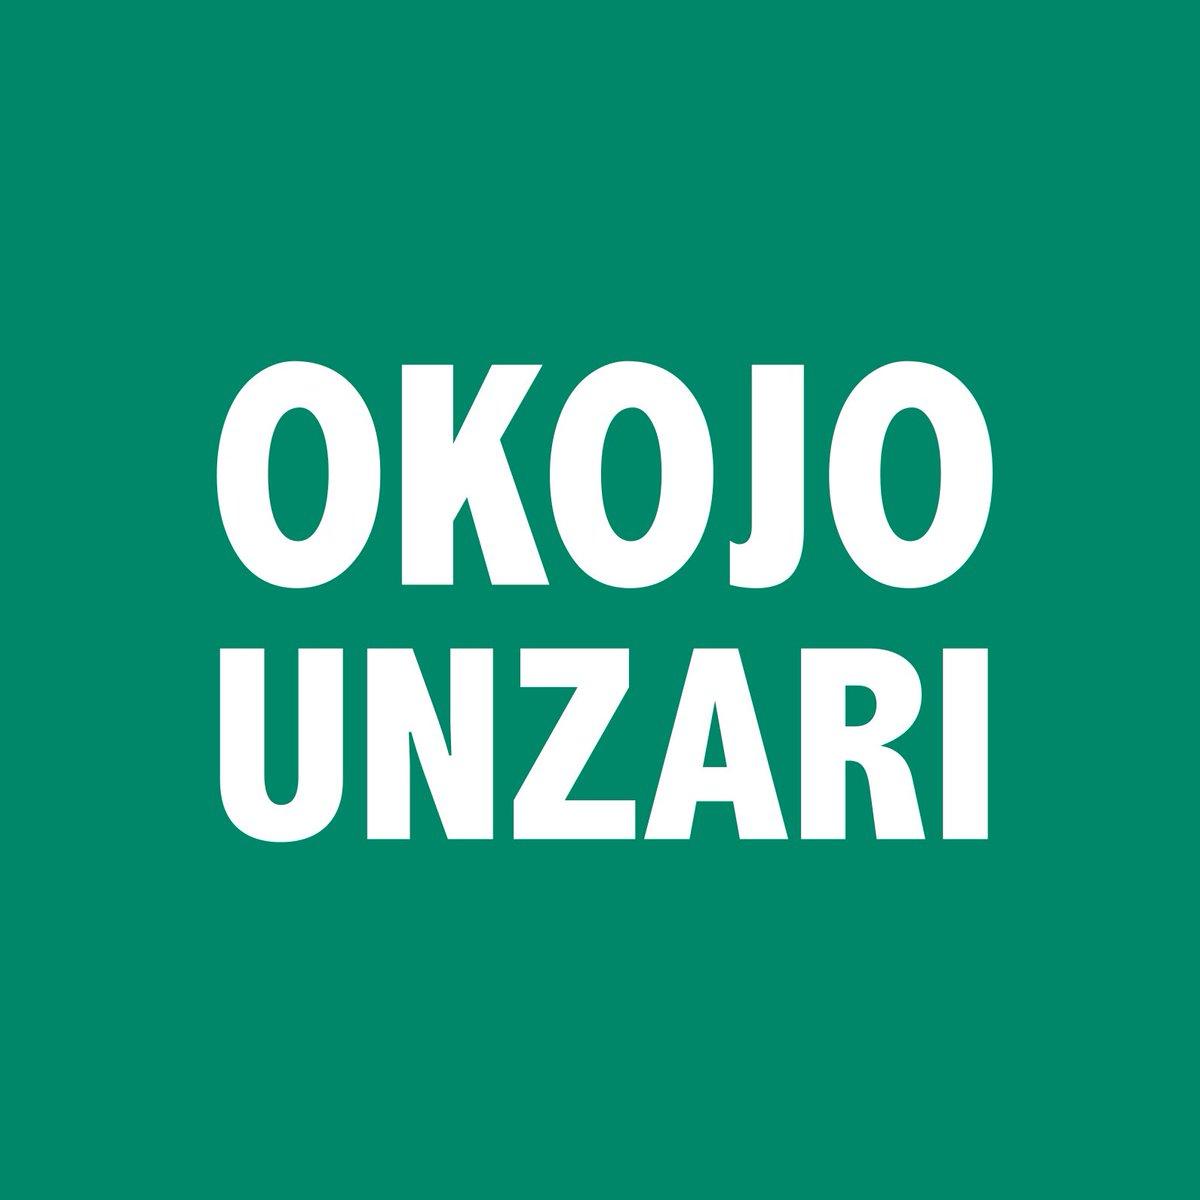 『OKOJO もううんざりだ! 歌詞』収録の『UNZARI』ジャケット